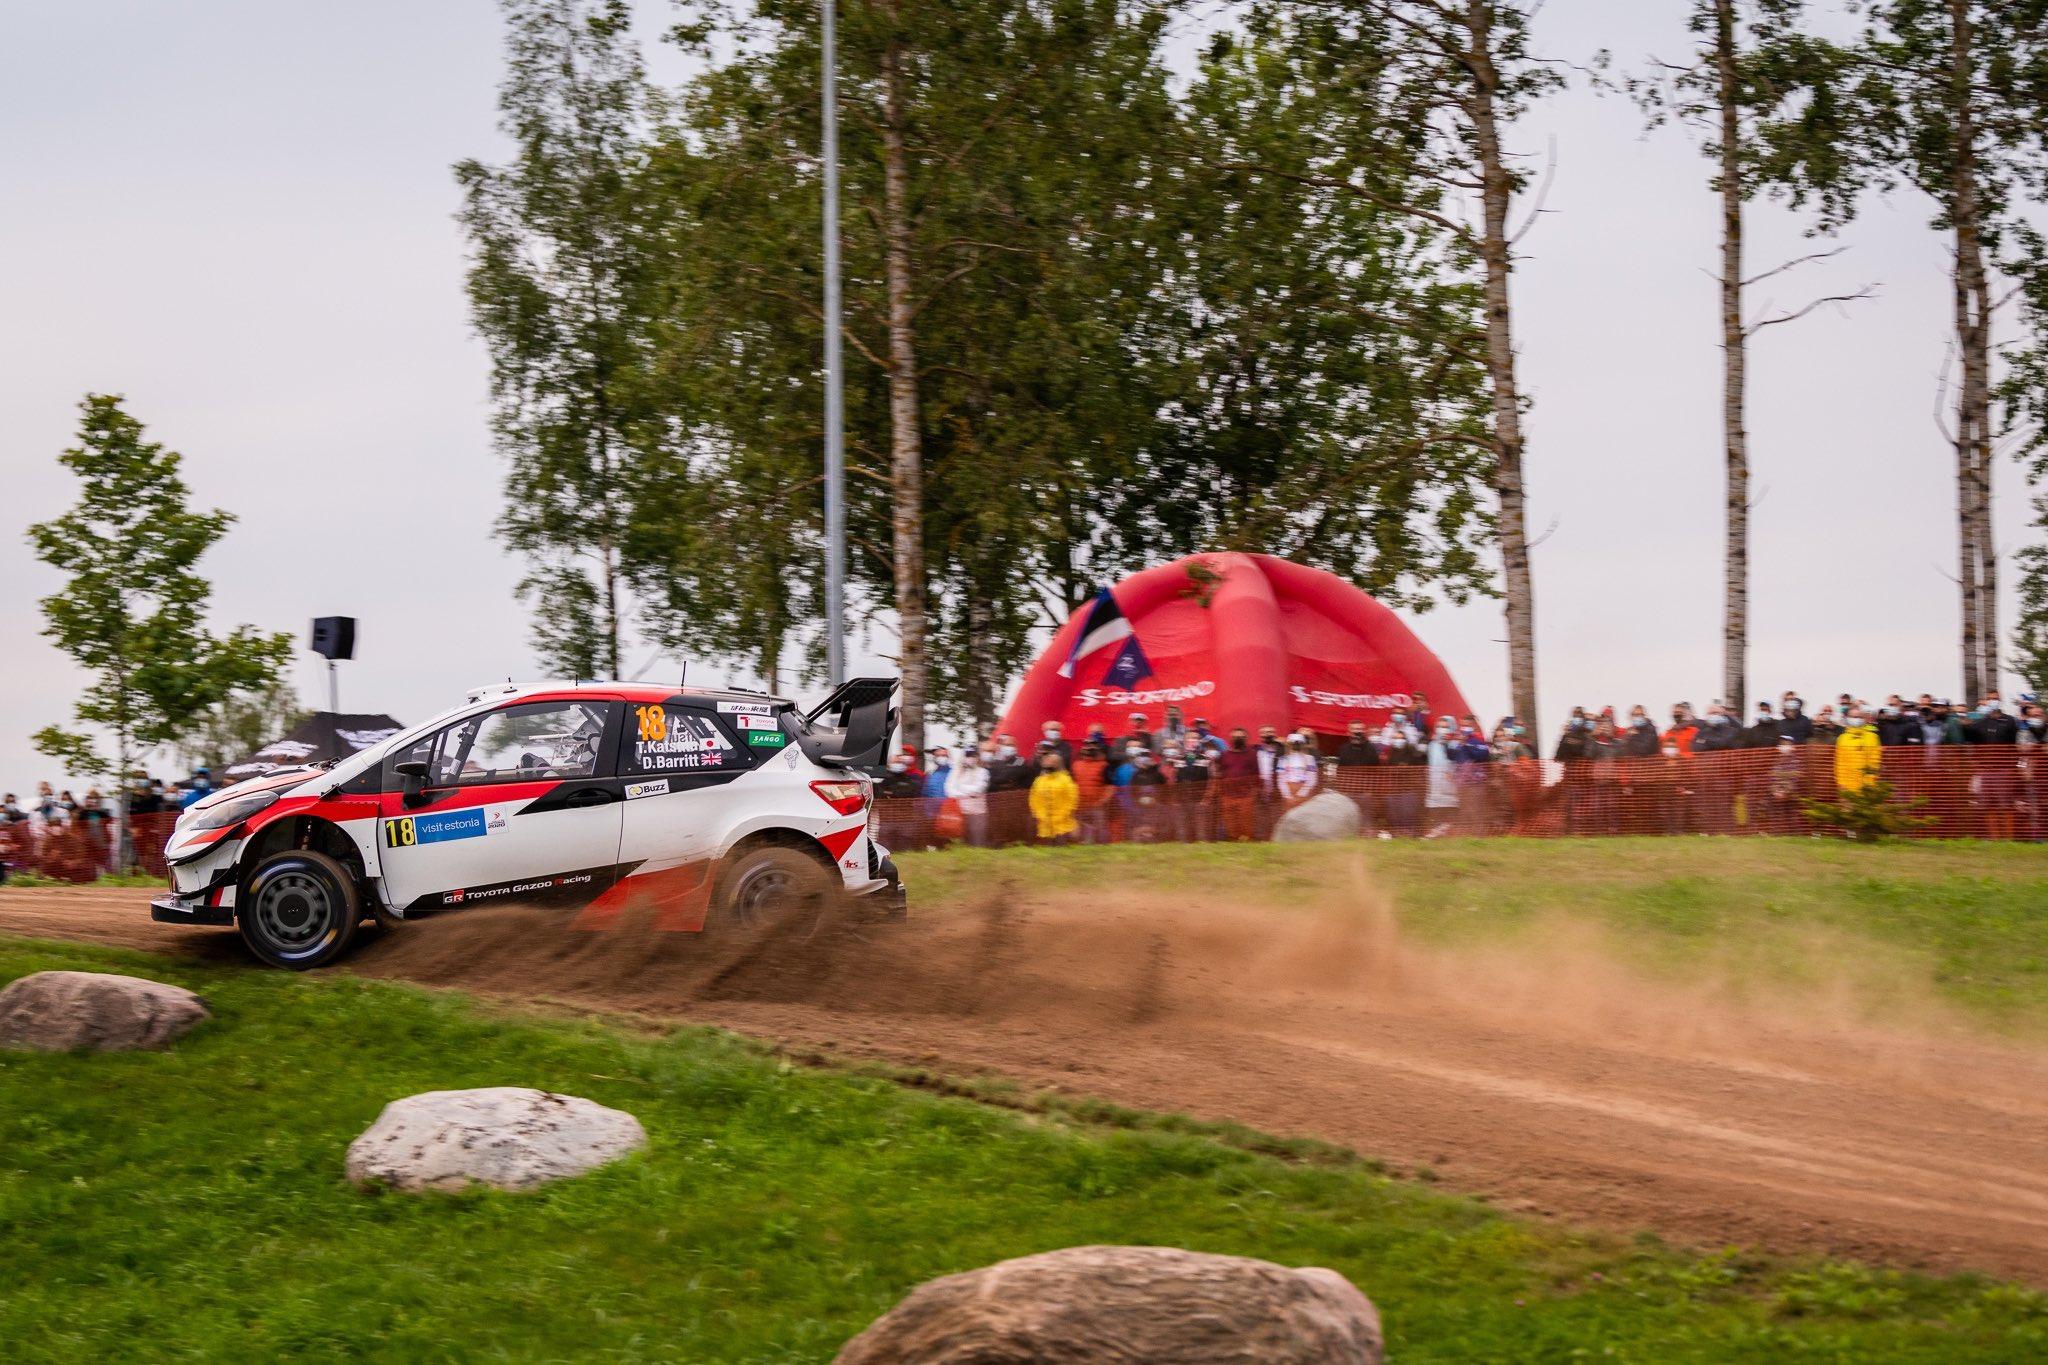 WRC: 10º Rallye Estonia [4-6 Septiembre] - Página 3 EhIrFS8VkAE6Ii9?format=jpg&name=large